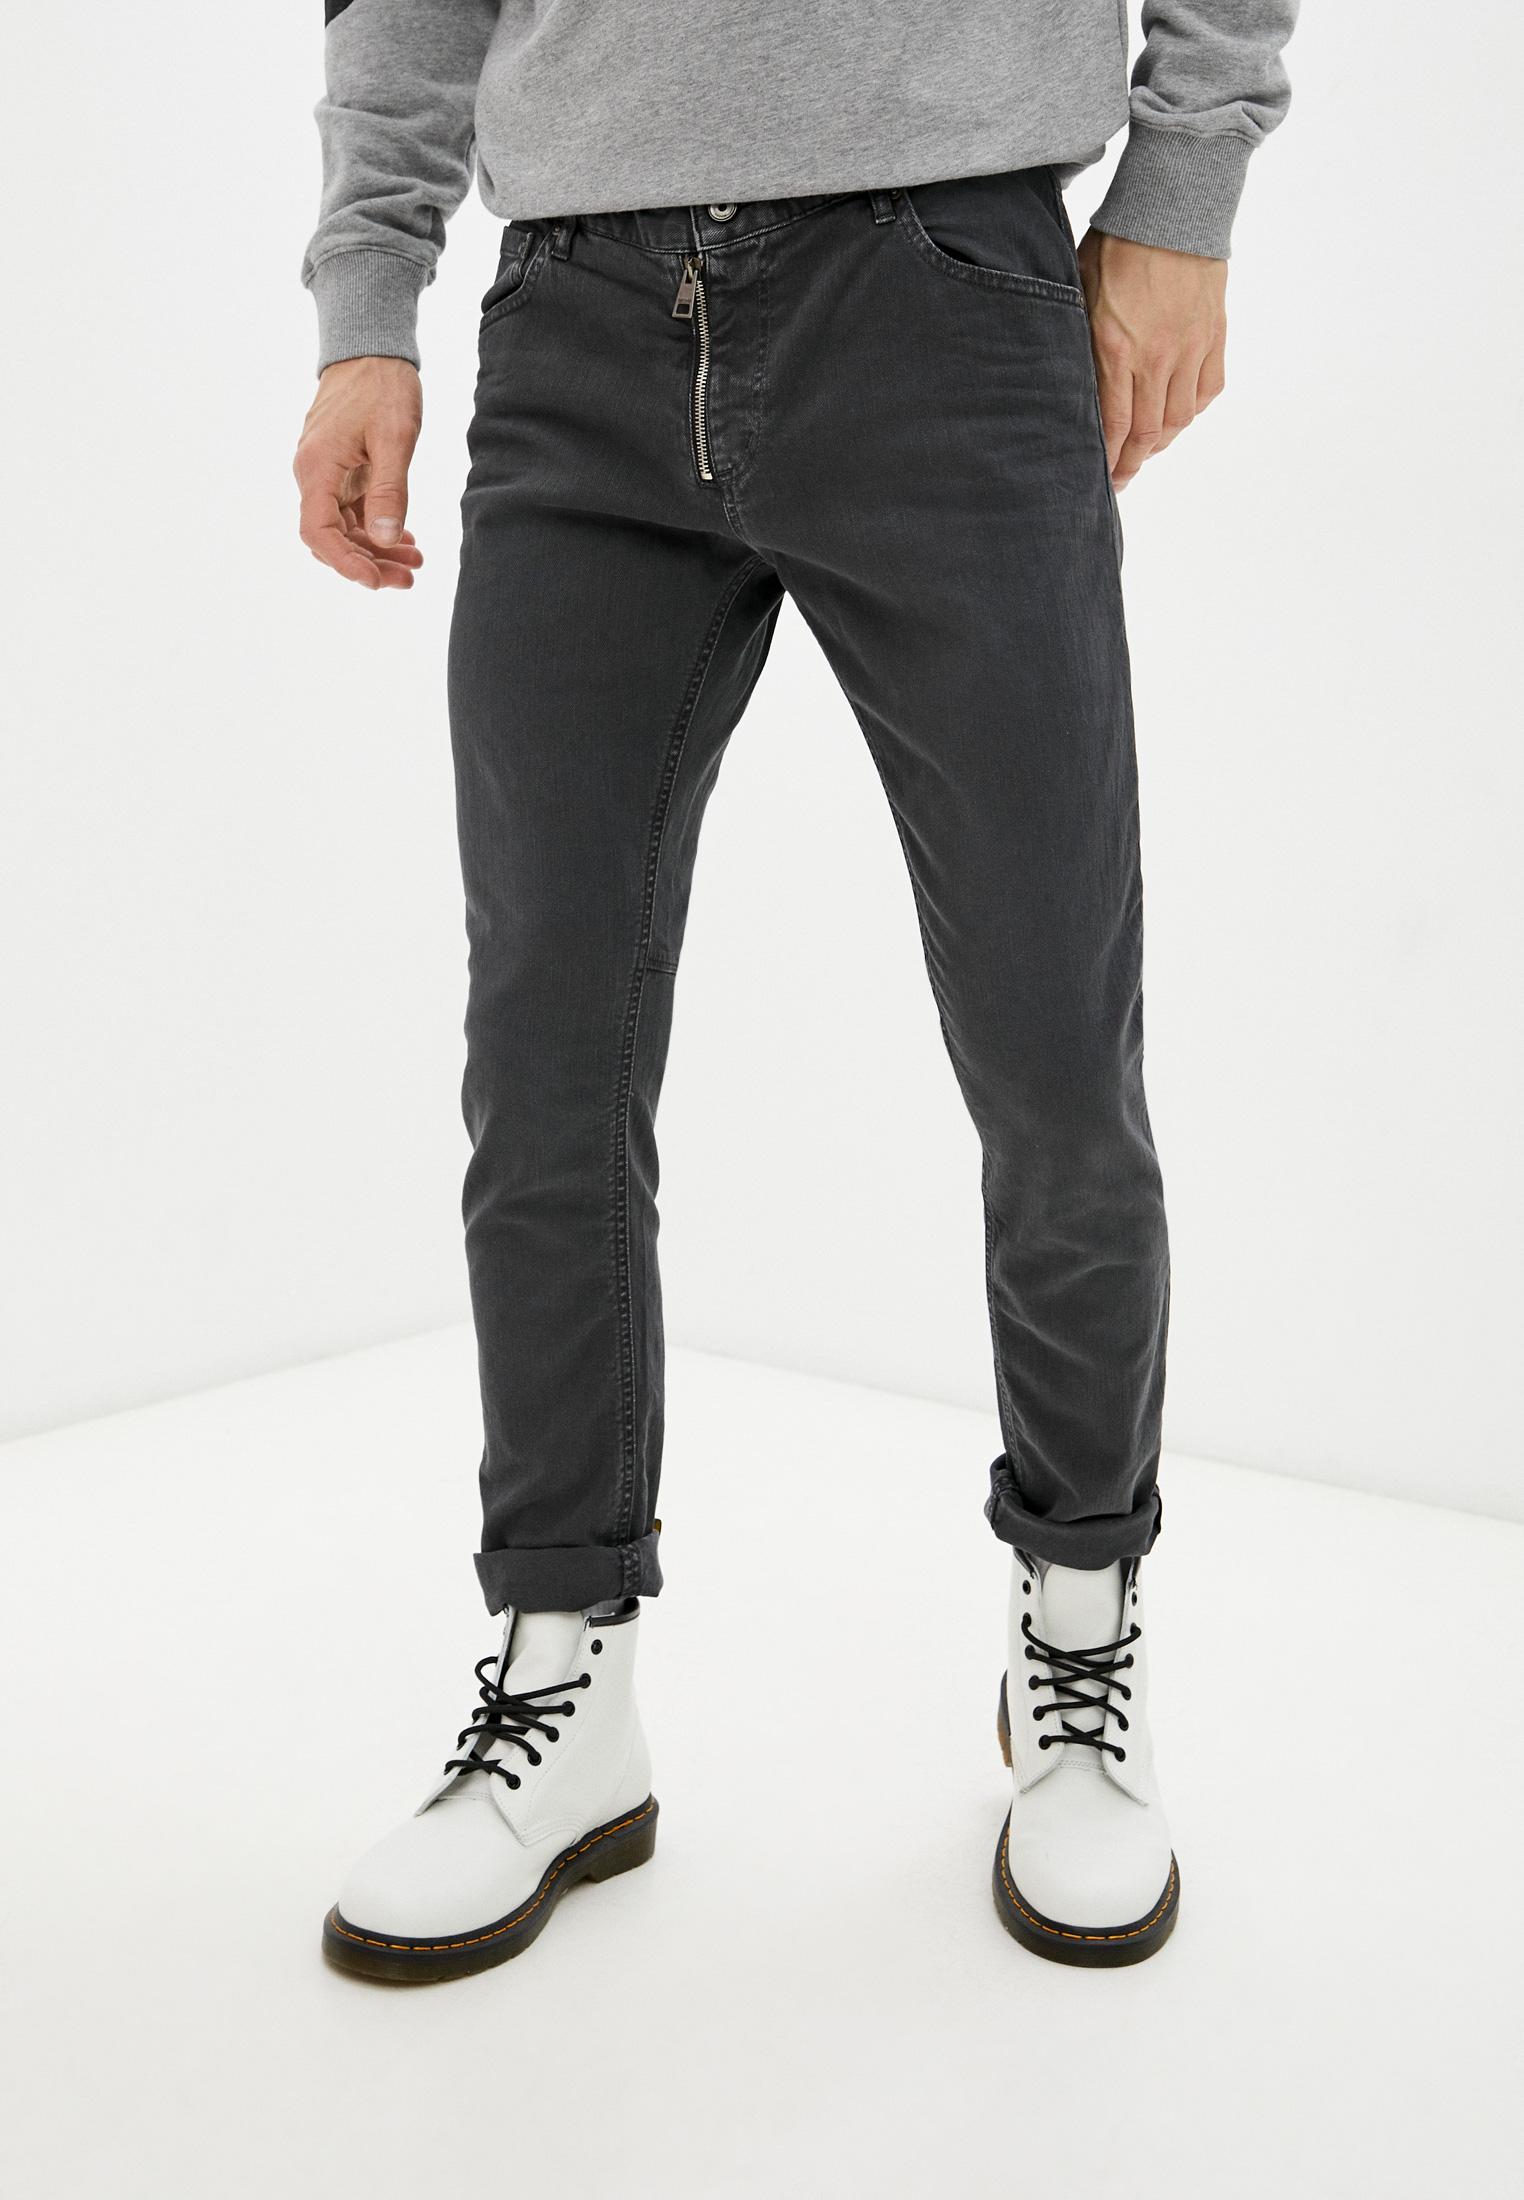 Мужские зауженные джинсы Just Cavalli (Джаст Кавалли) S01KA0145 N31259